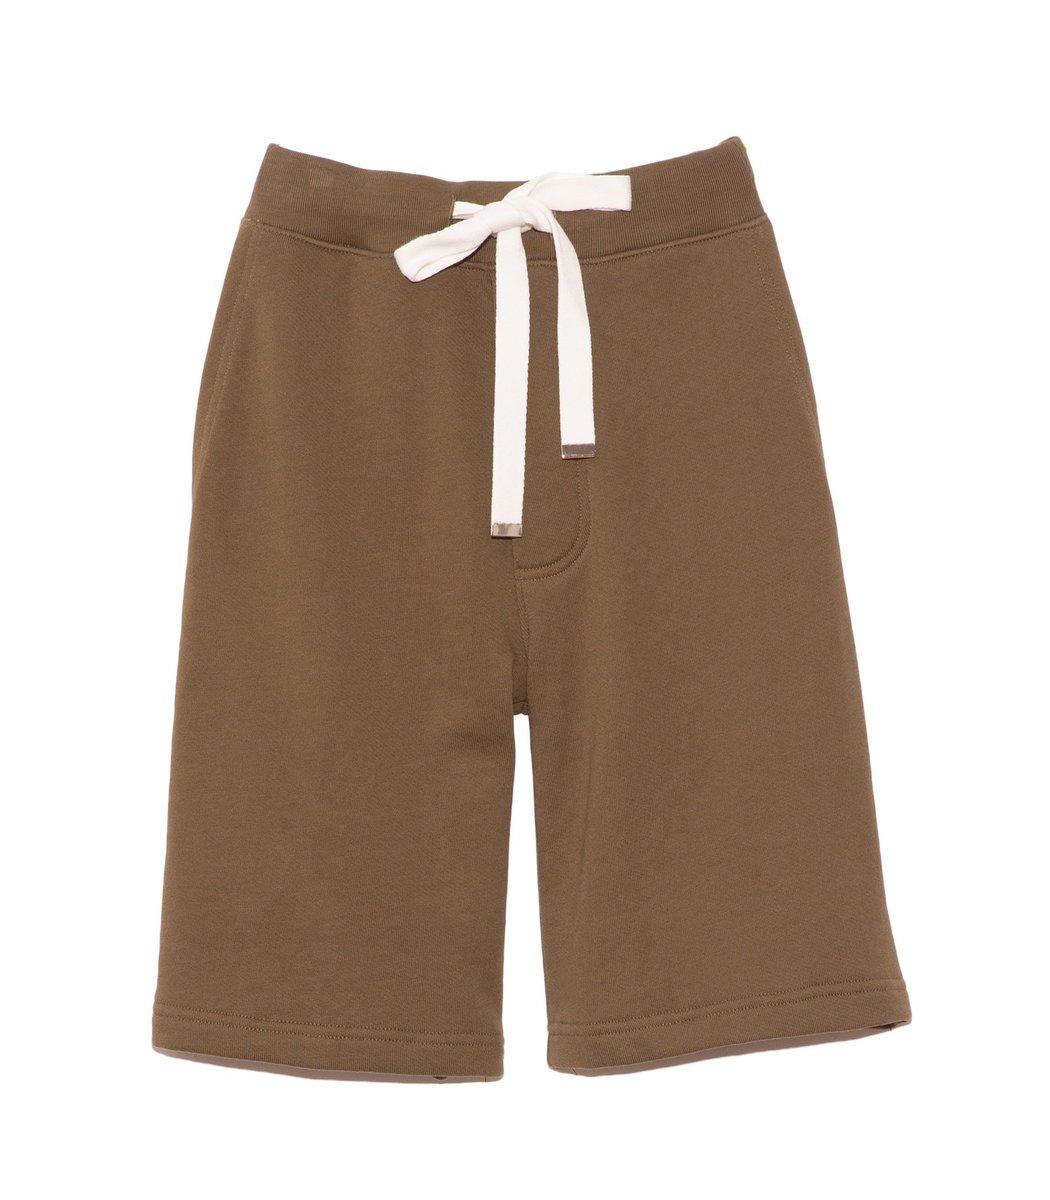 Tibi Cottons Sweatshirt Short in Loden